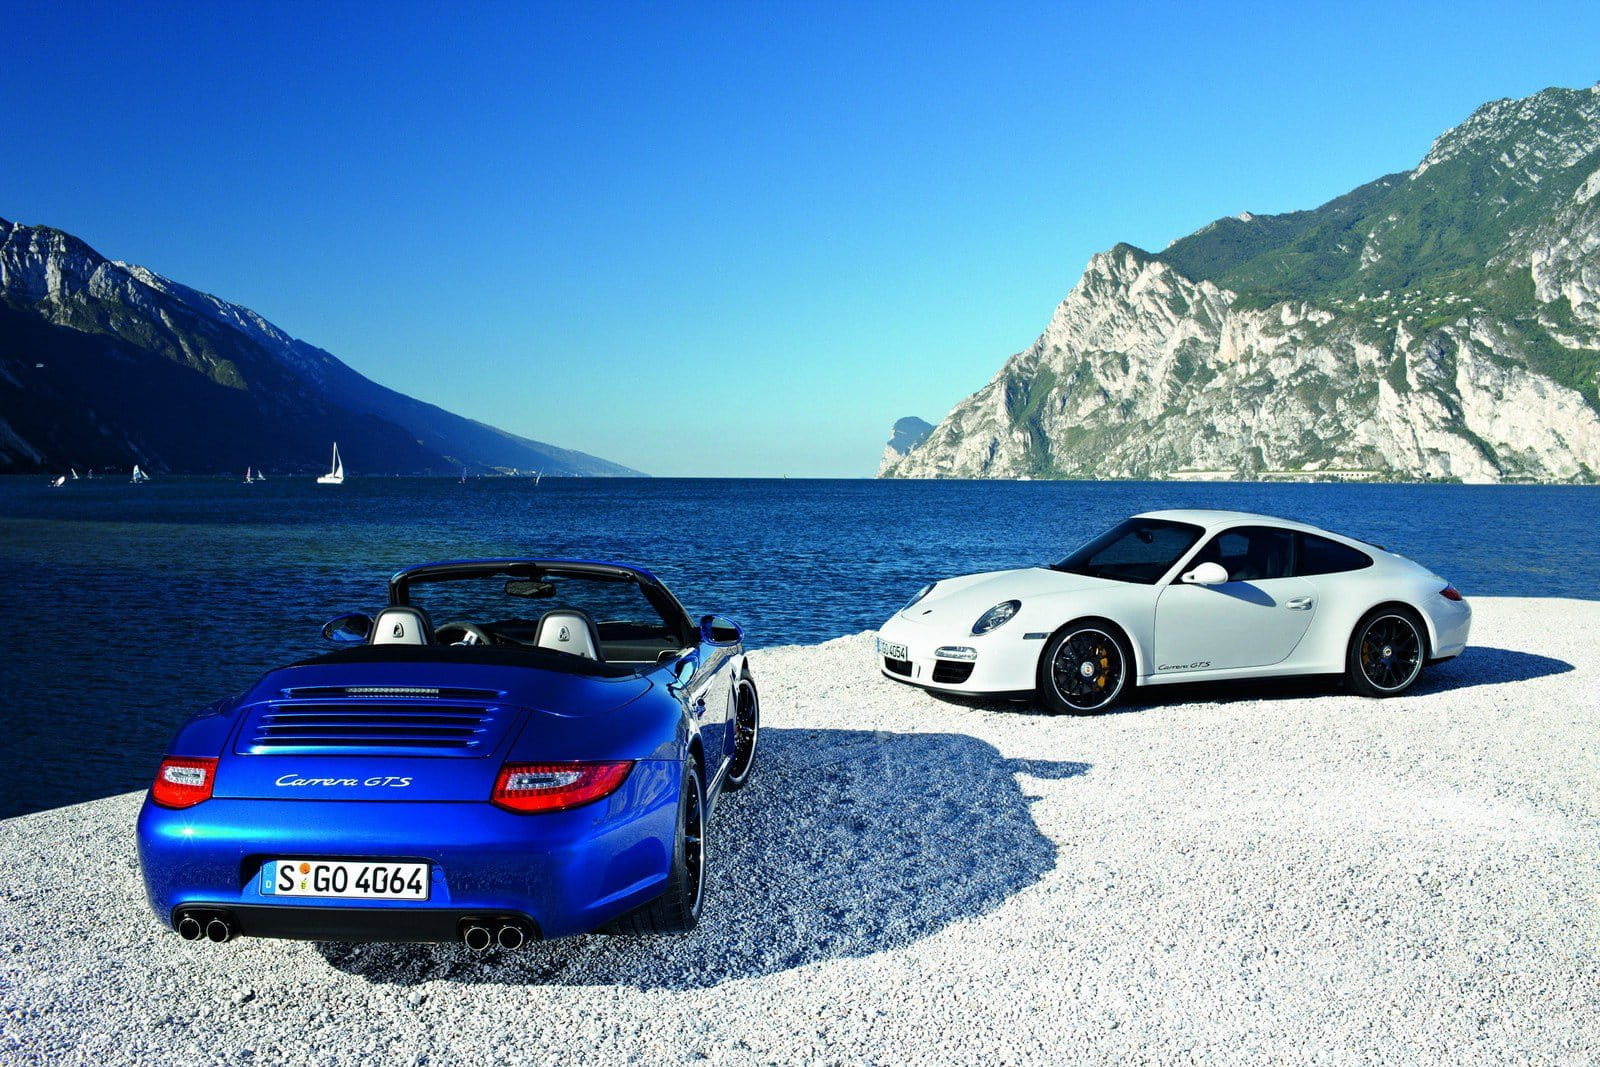 Porsche 911 Carrera GTS Cabriolet (2010) (ver imagen original)